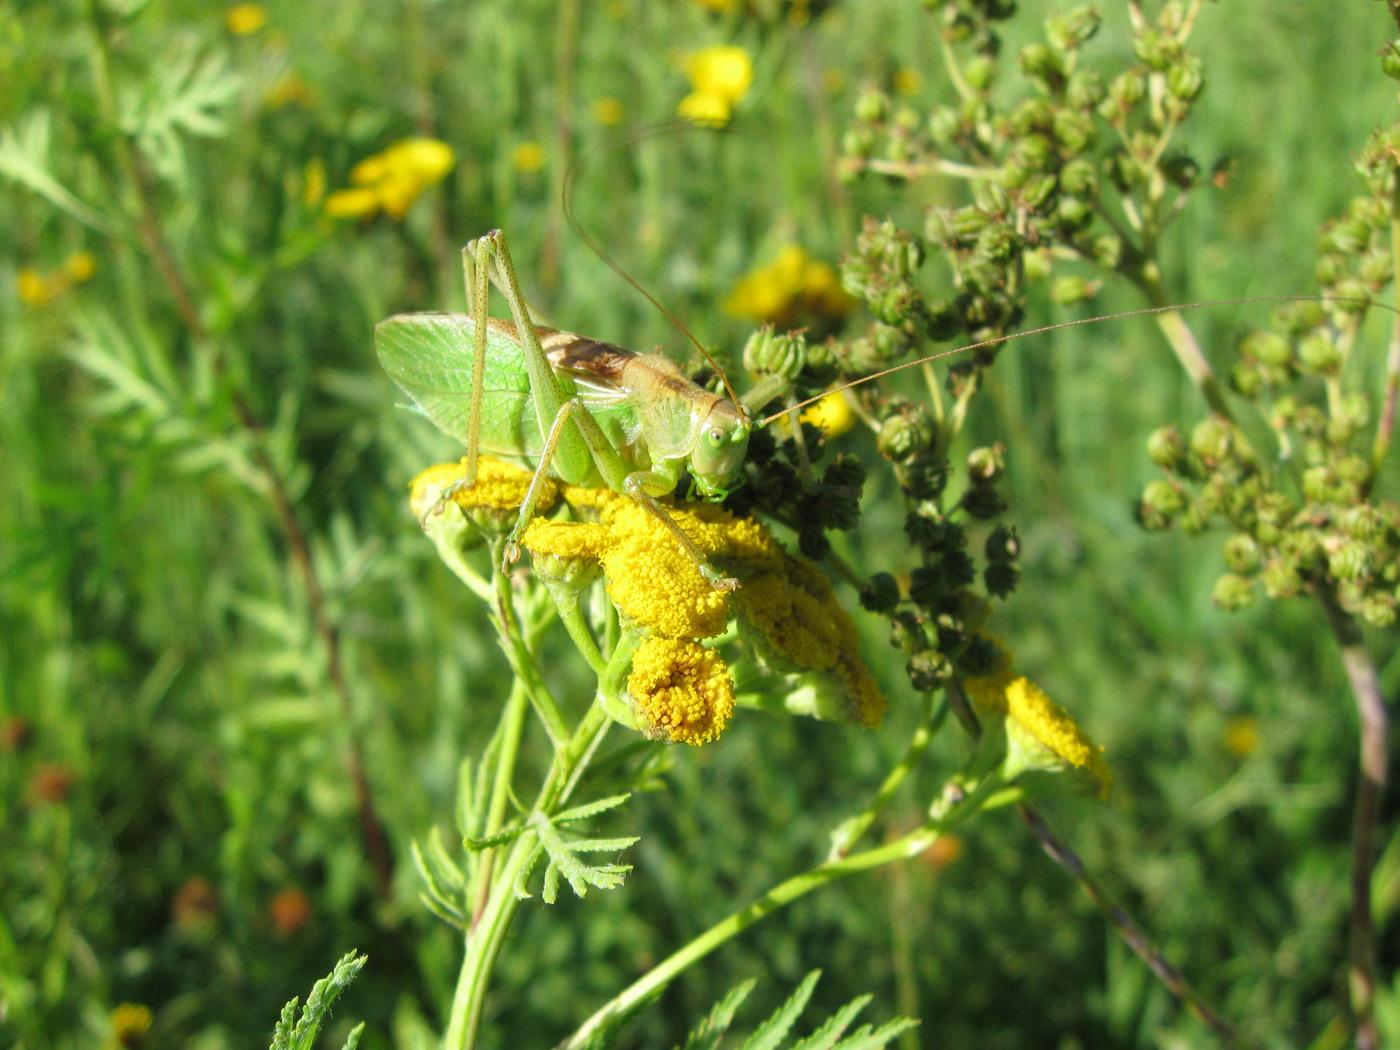 Кузнечик зелёный (Tettigonia viridissima) Автор: Олег Селиверстов